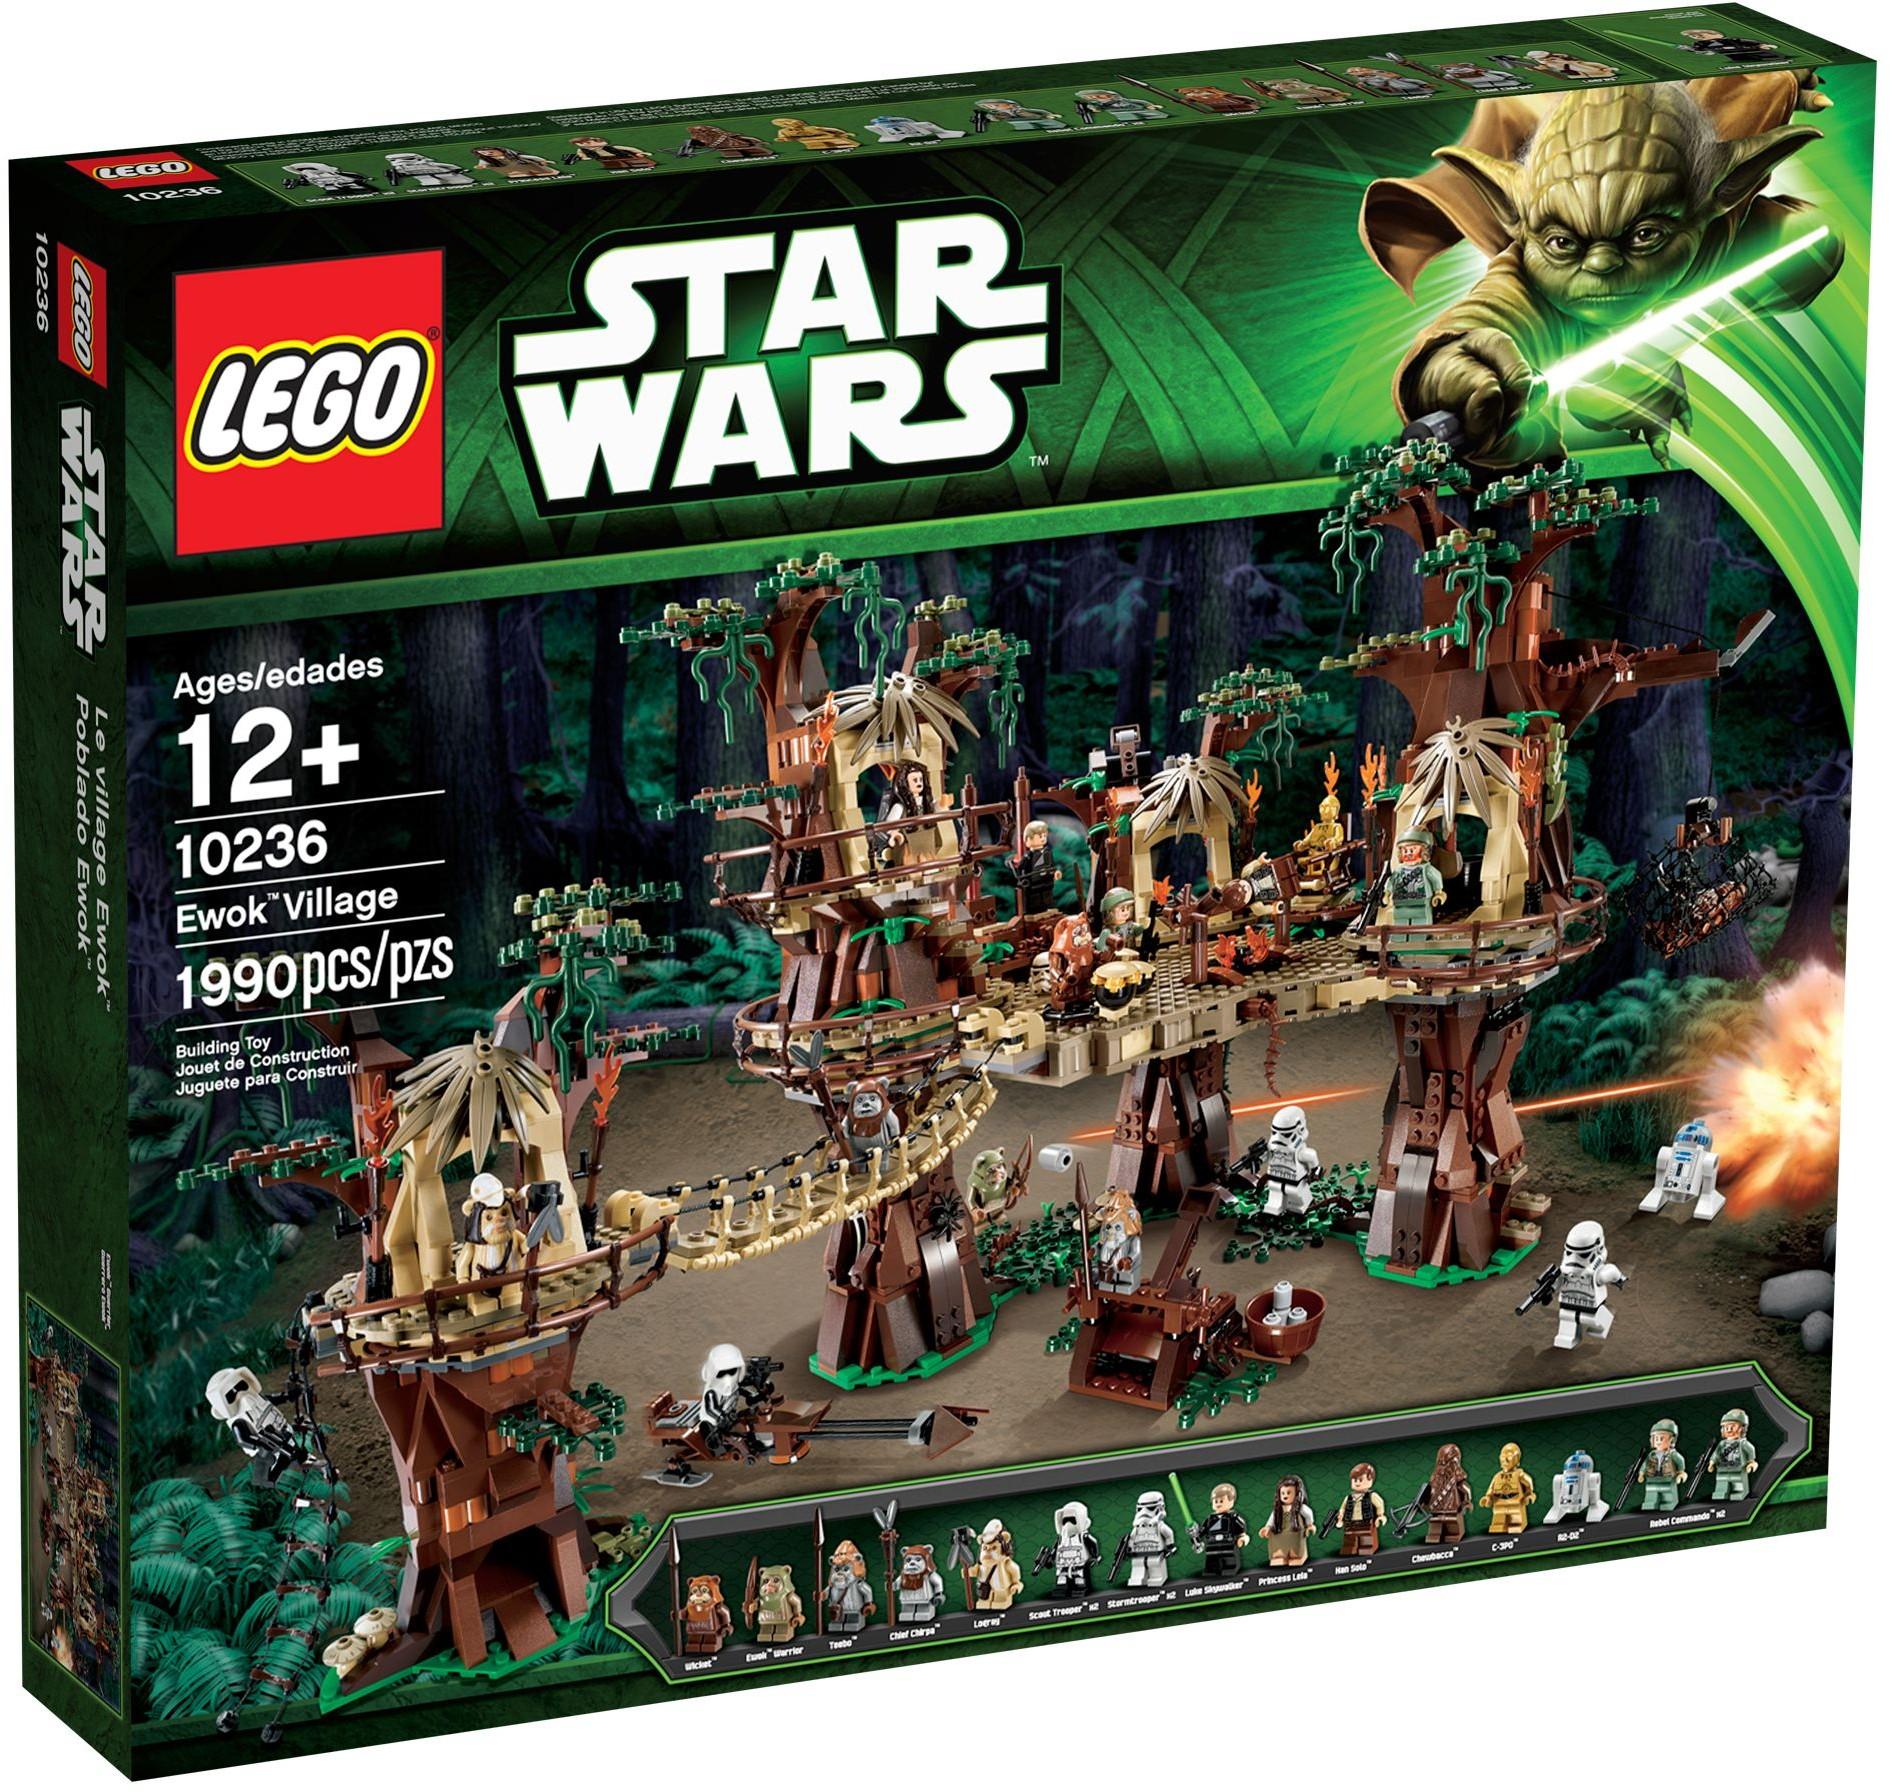 LEGO Star Wars 10236 pas cher